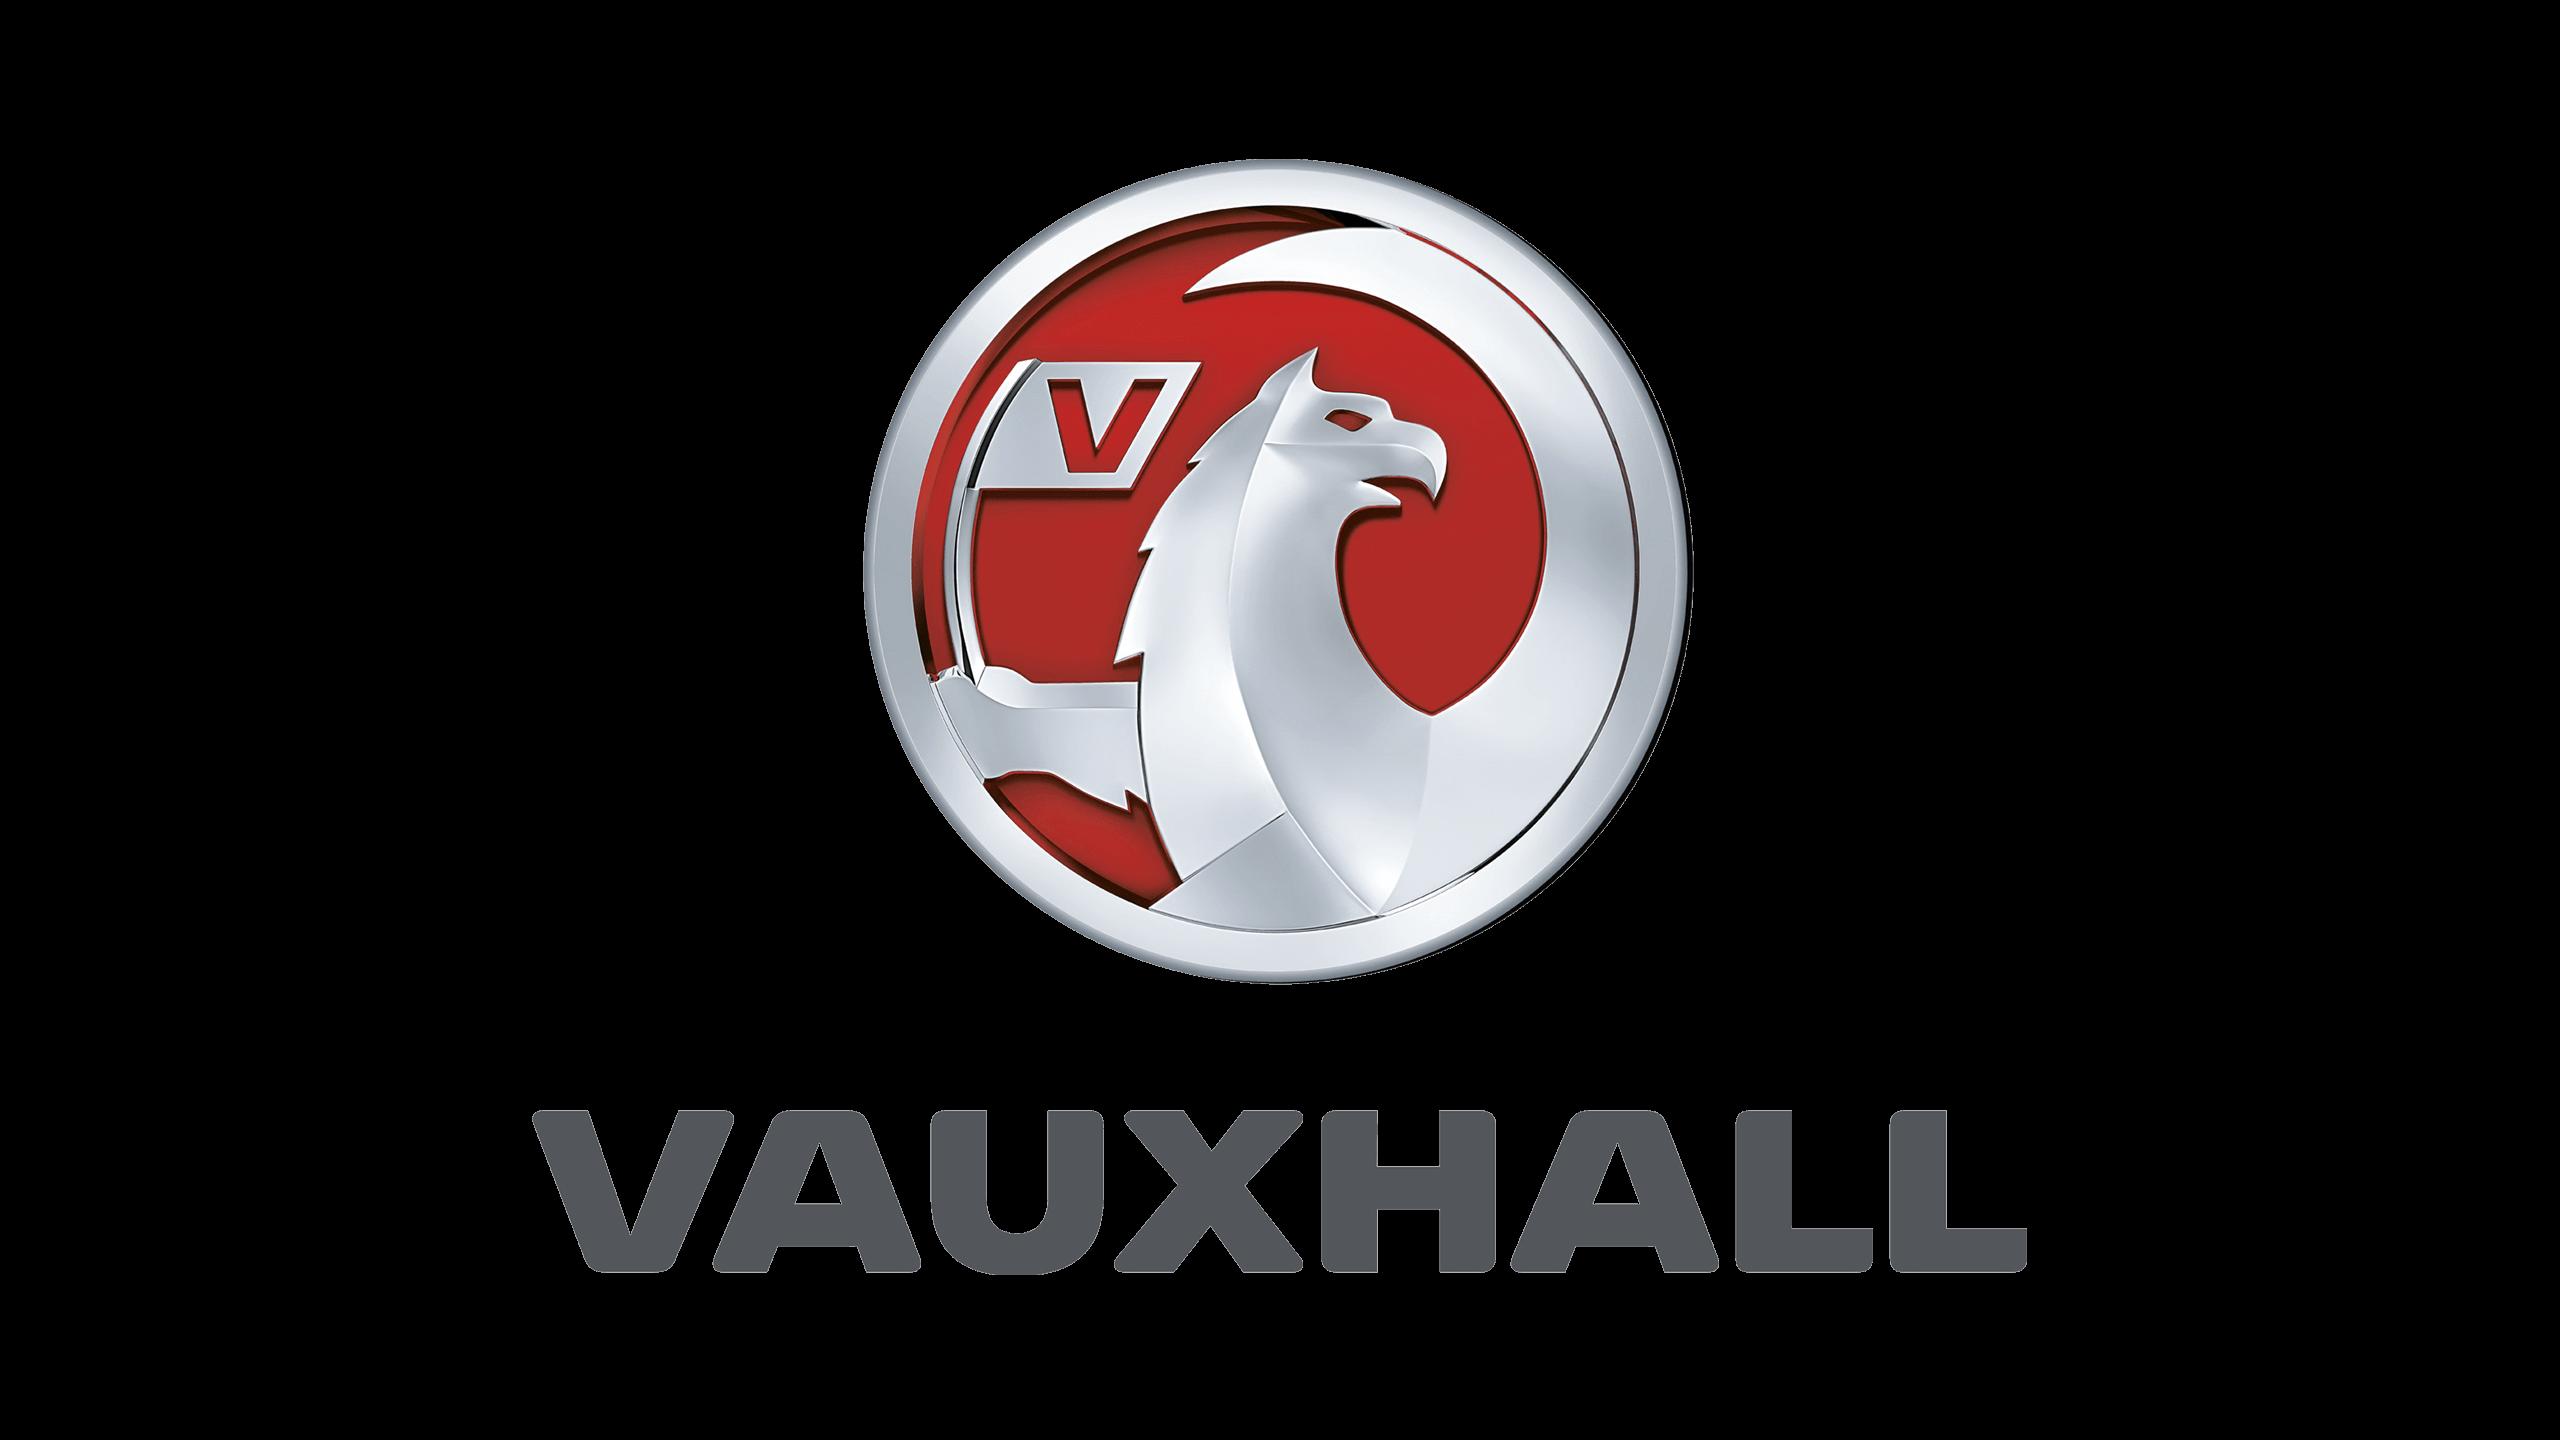 Logo de voiture Vauxhall PNG transparents - StickPNG